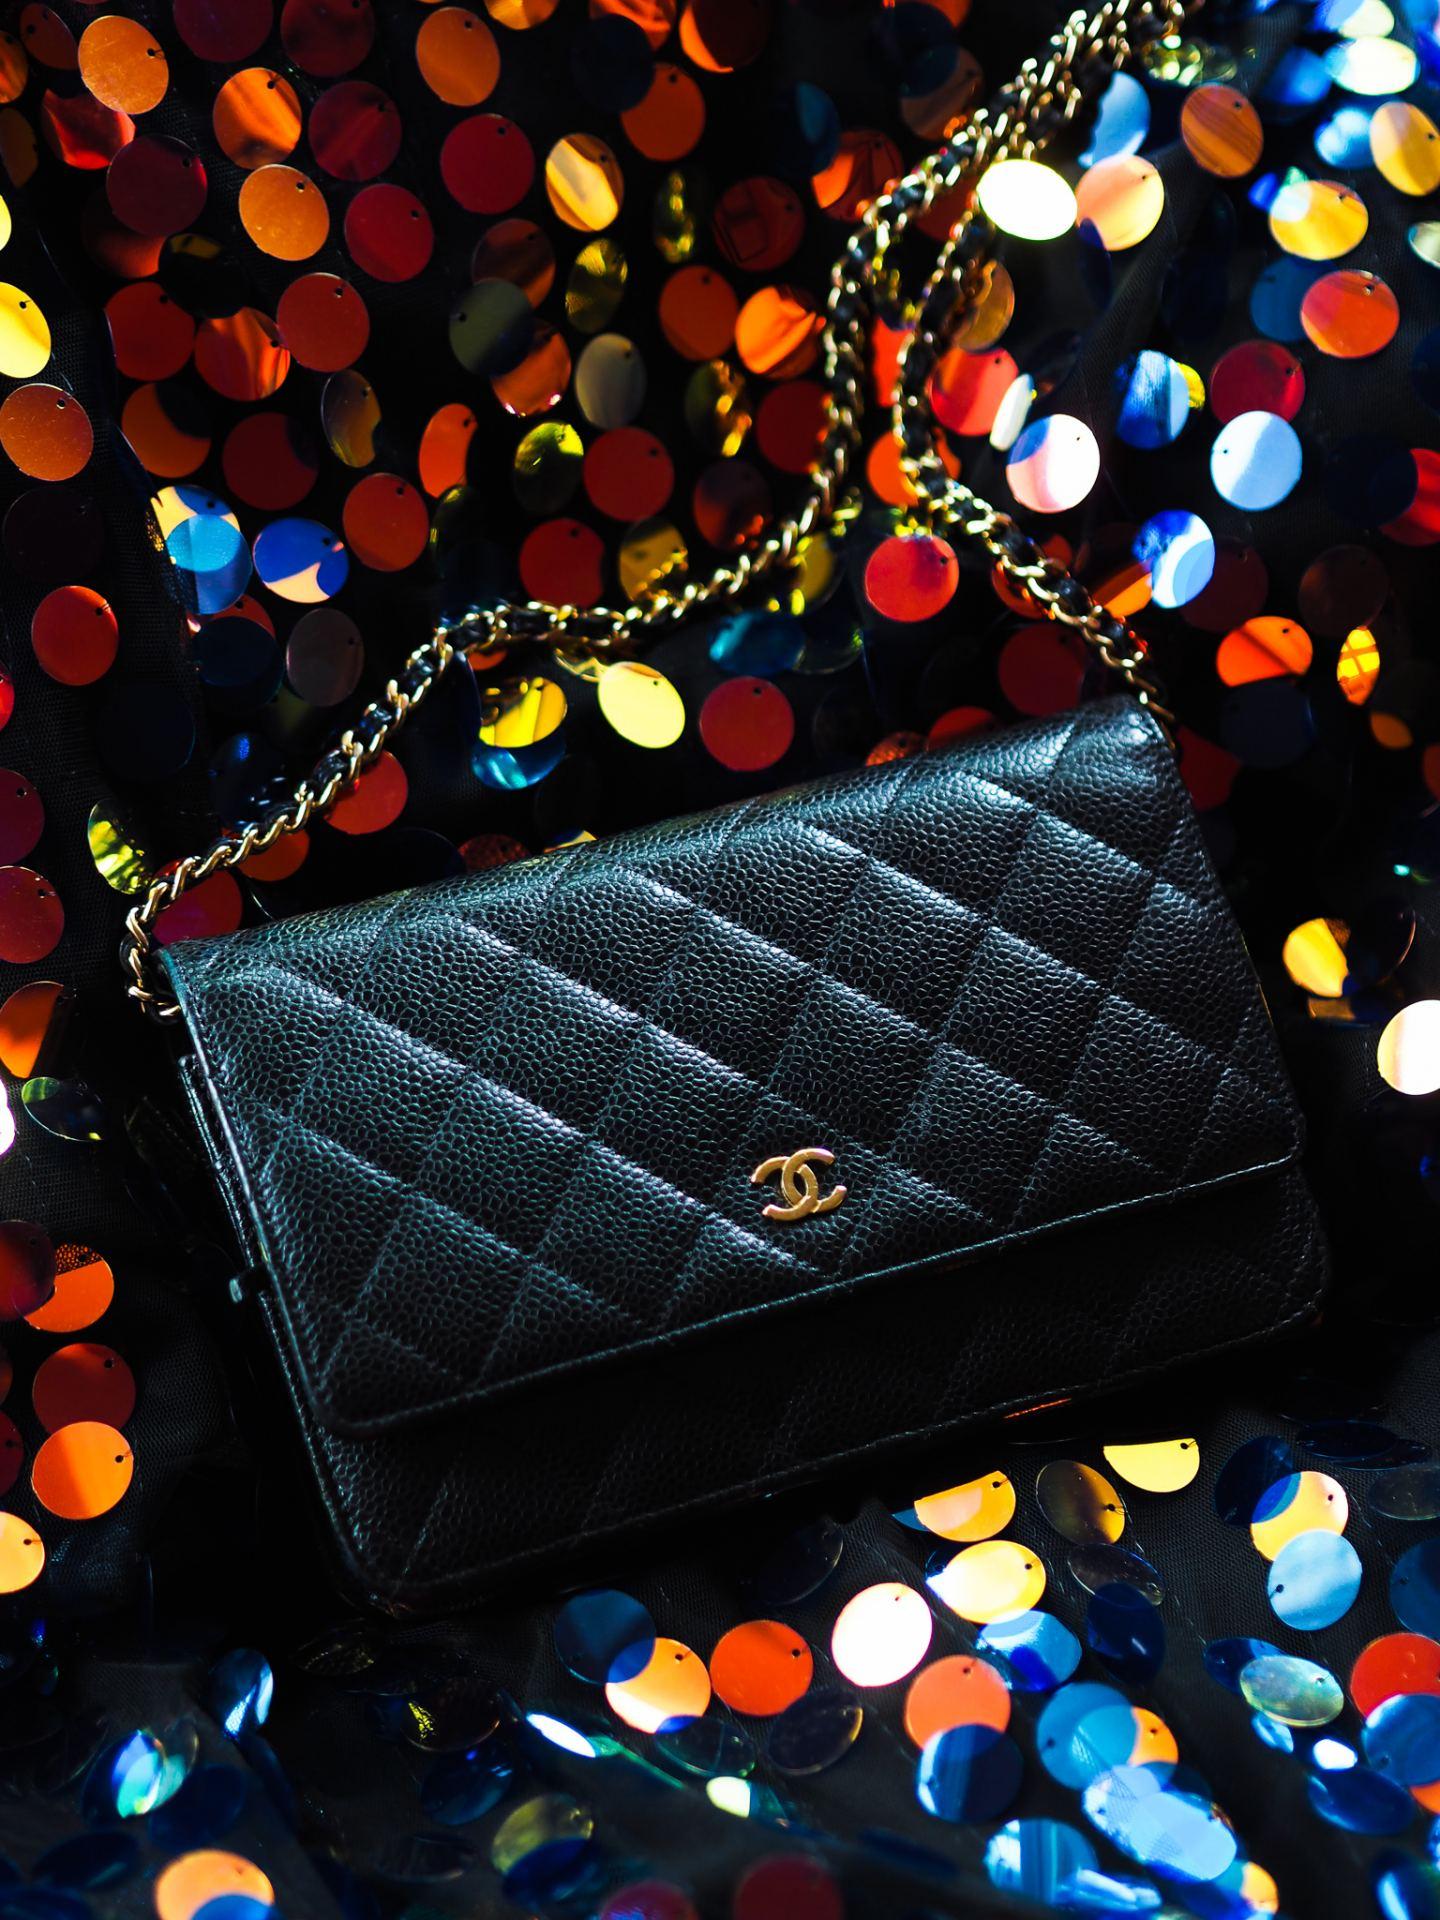 Most Popular Chanel Bag?